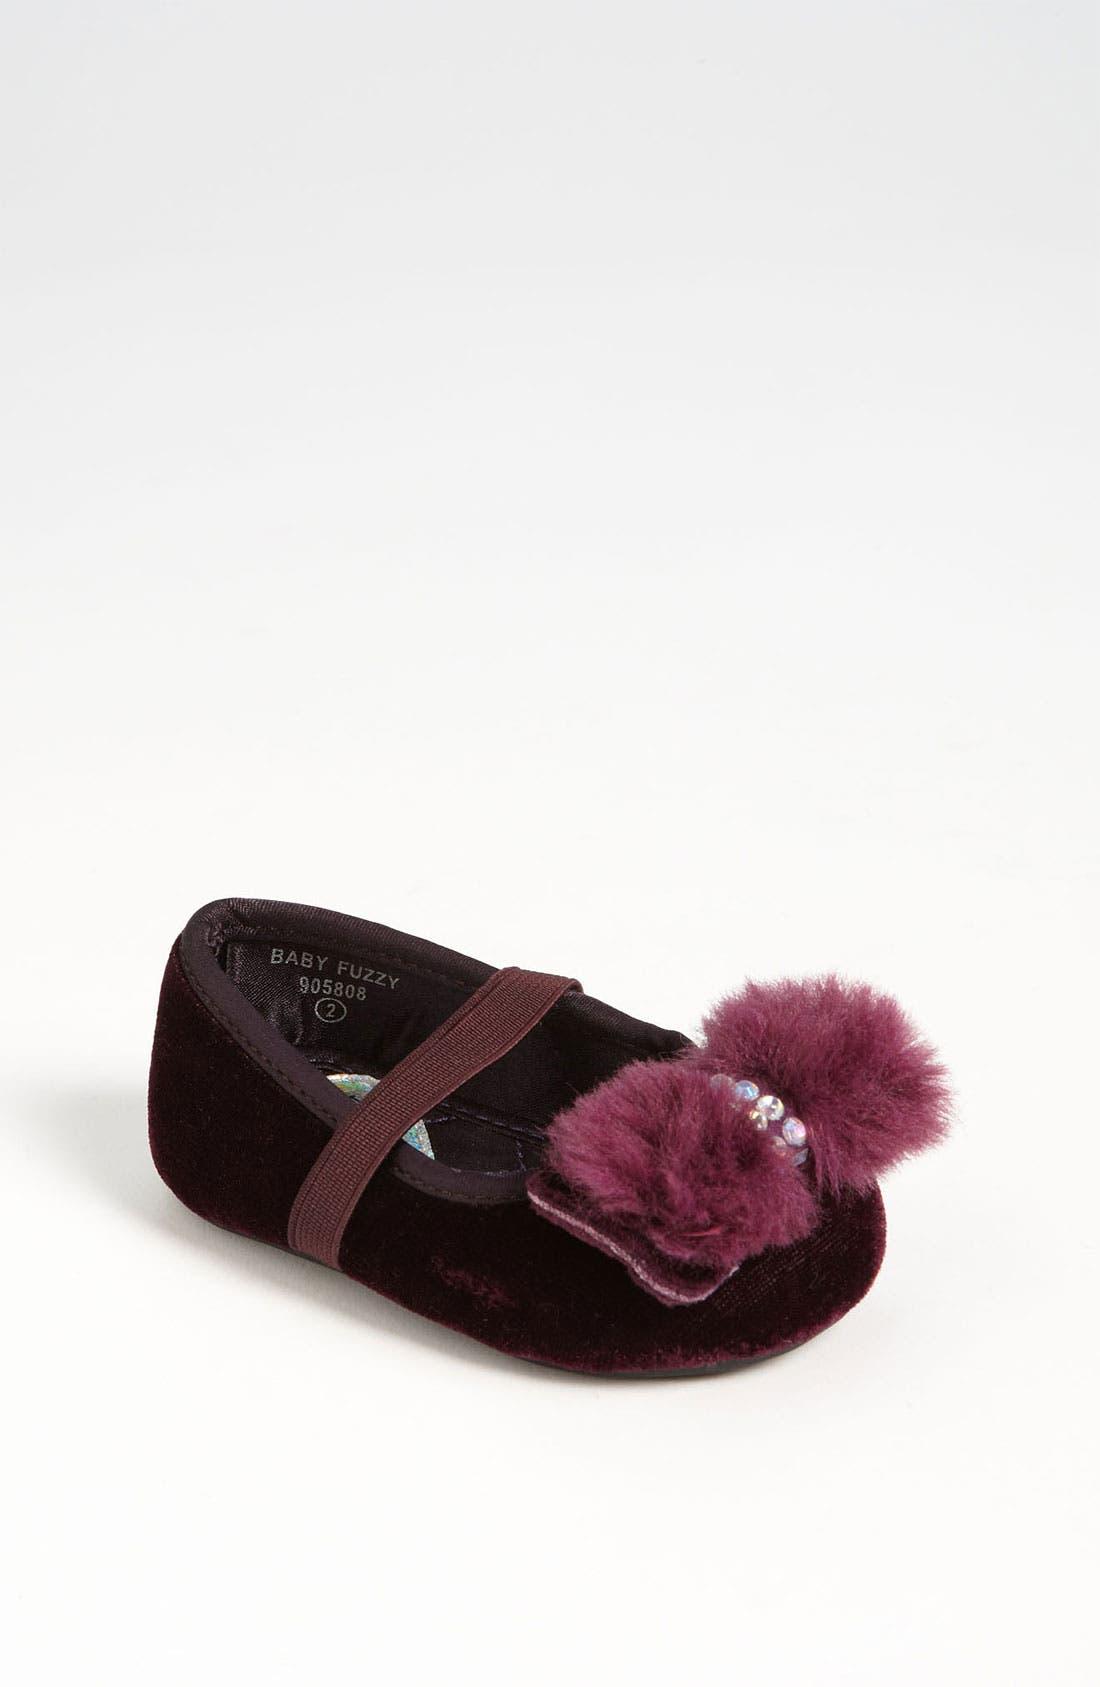 Main Image - Stuart Weitzman 'Baby Furry' Crib Shoe (Baby)